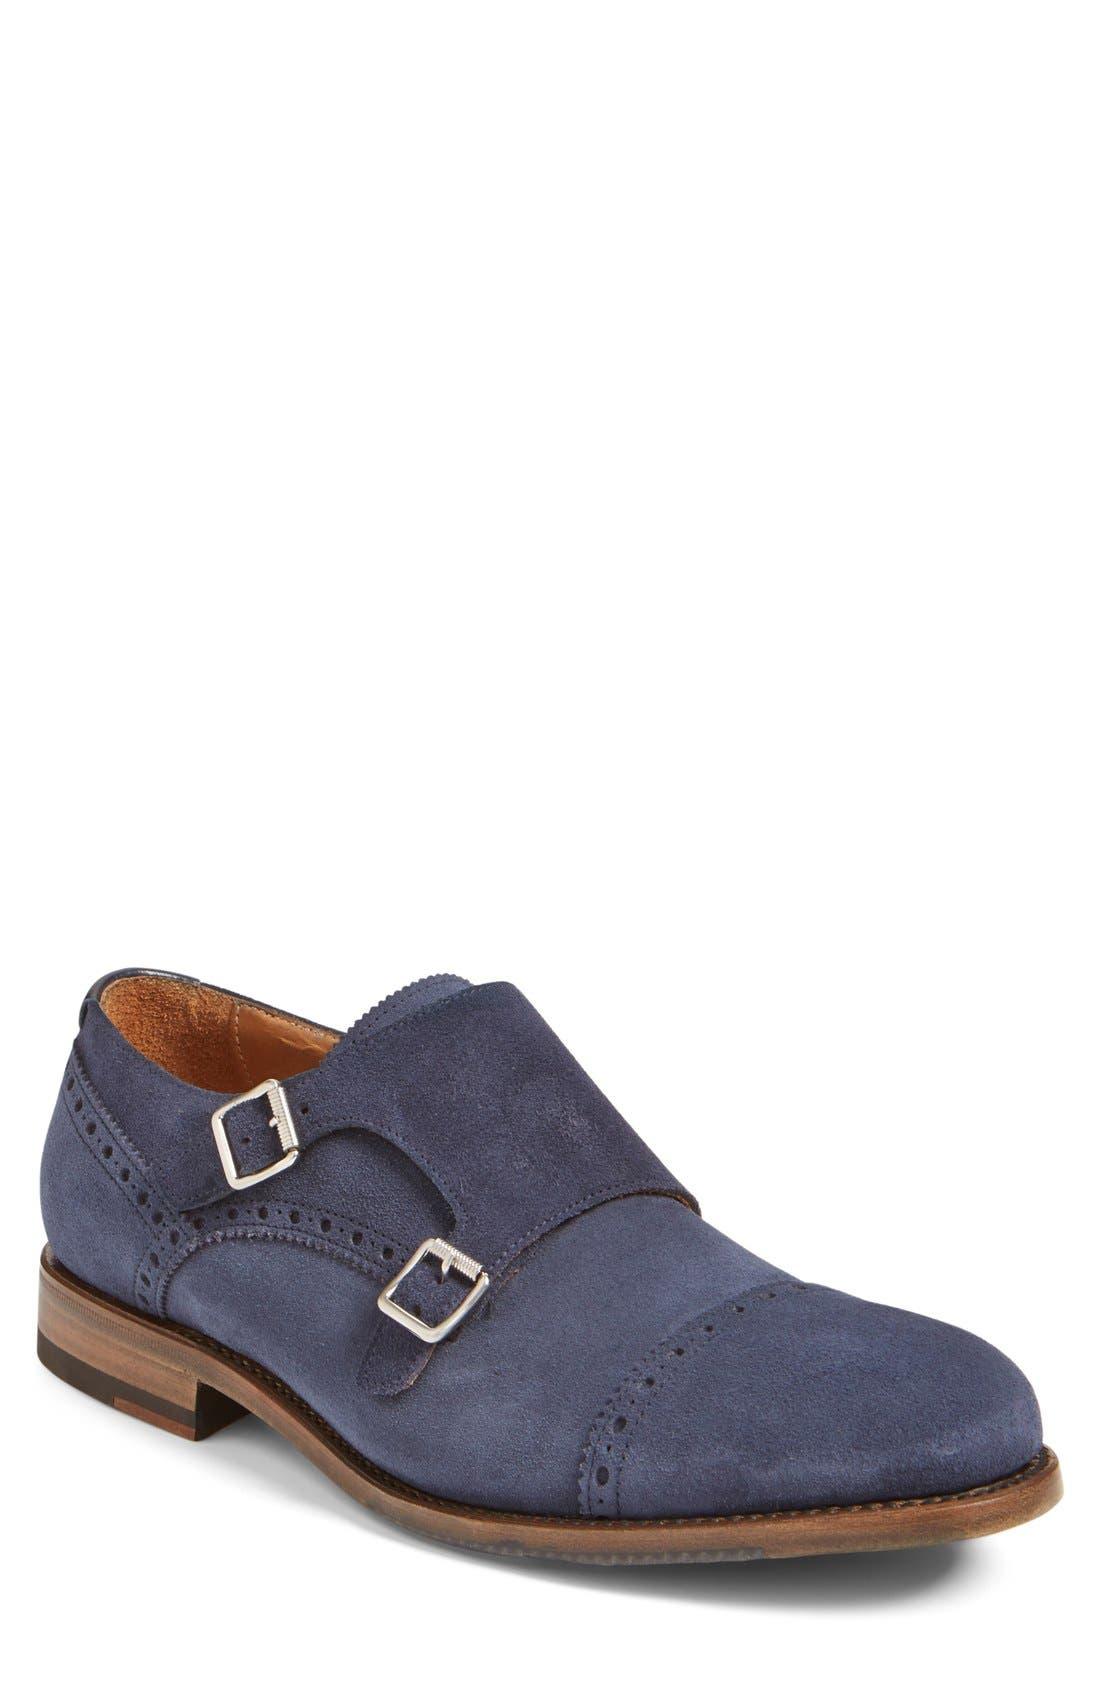 Aquatalia 'Fallon' Weatherproof Monk Strap Shoe (Men)